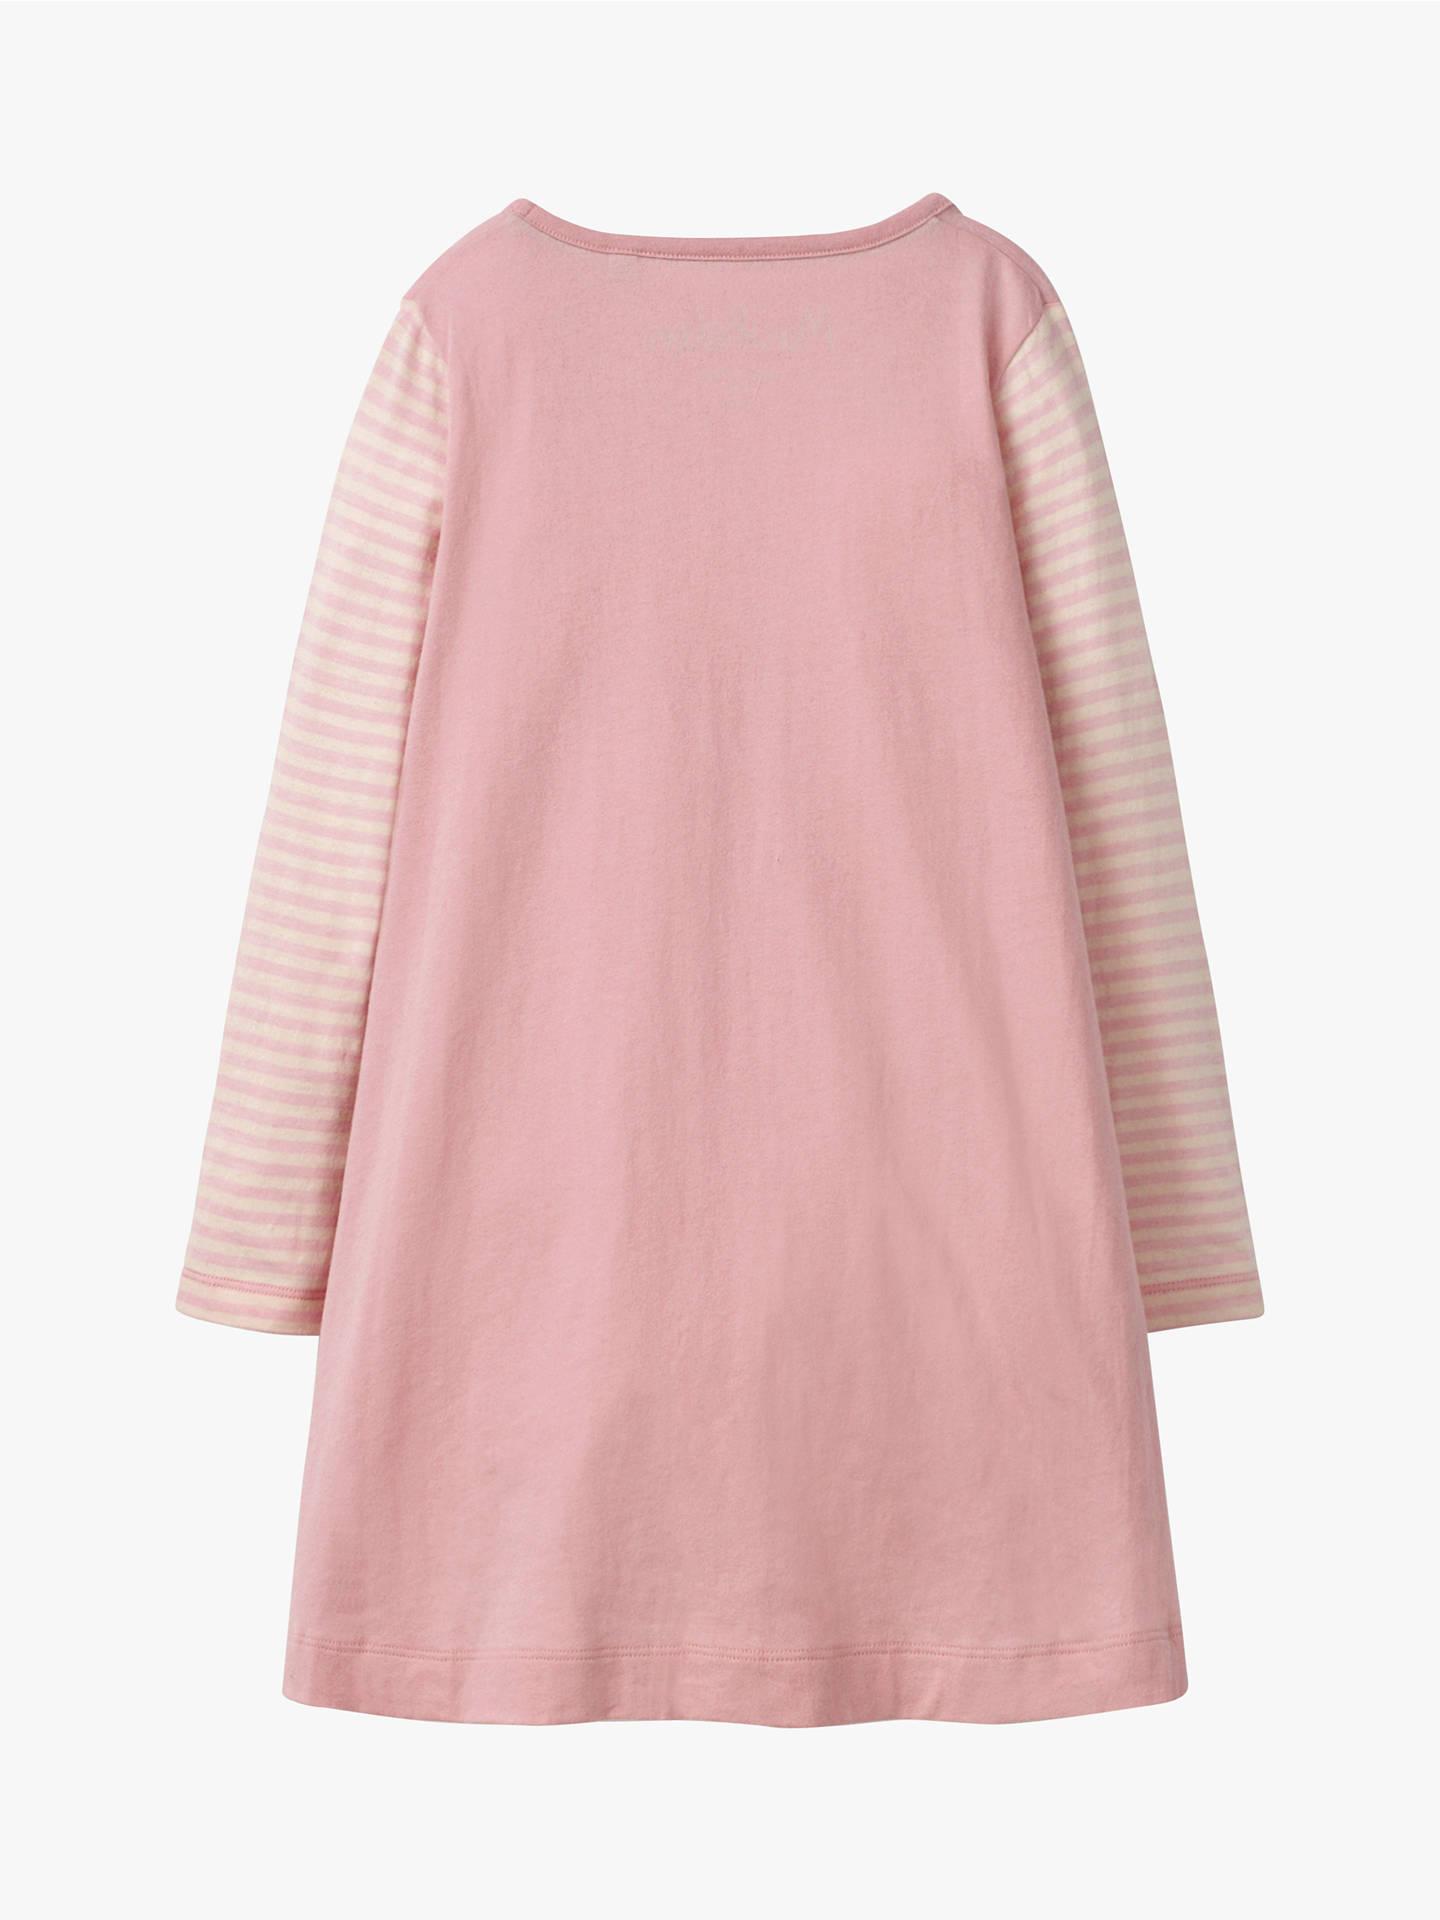 06b1d5f2d7af Mini Boden Girls  Festive Robin Applique Dress